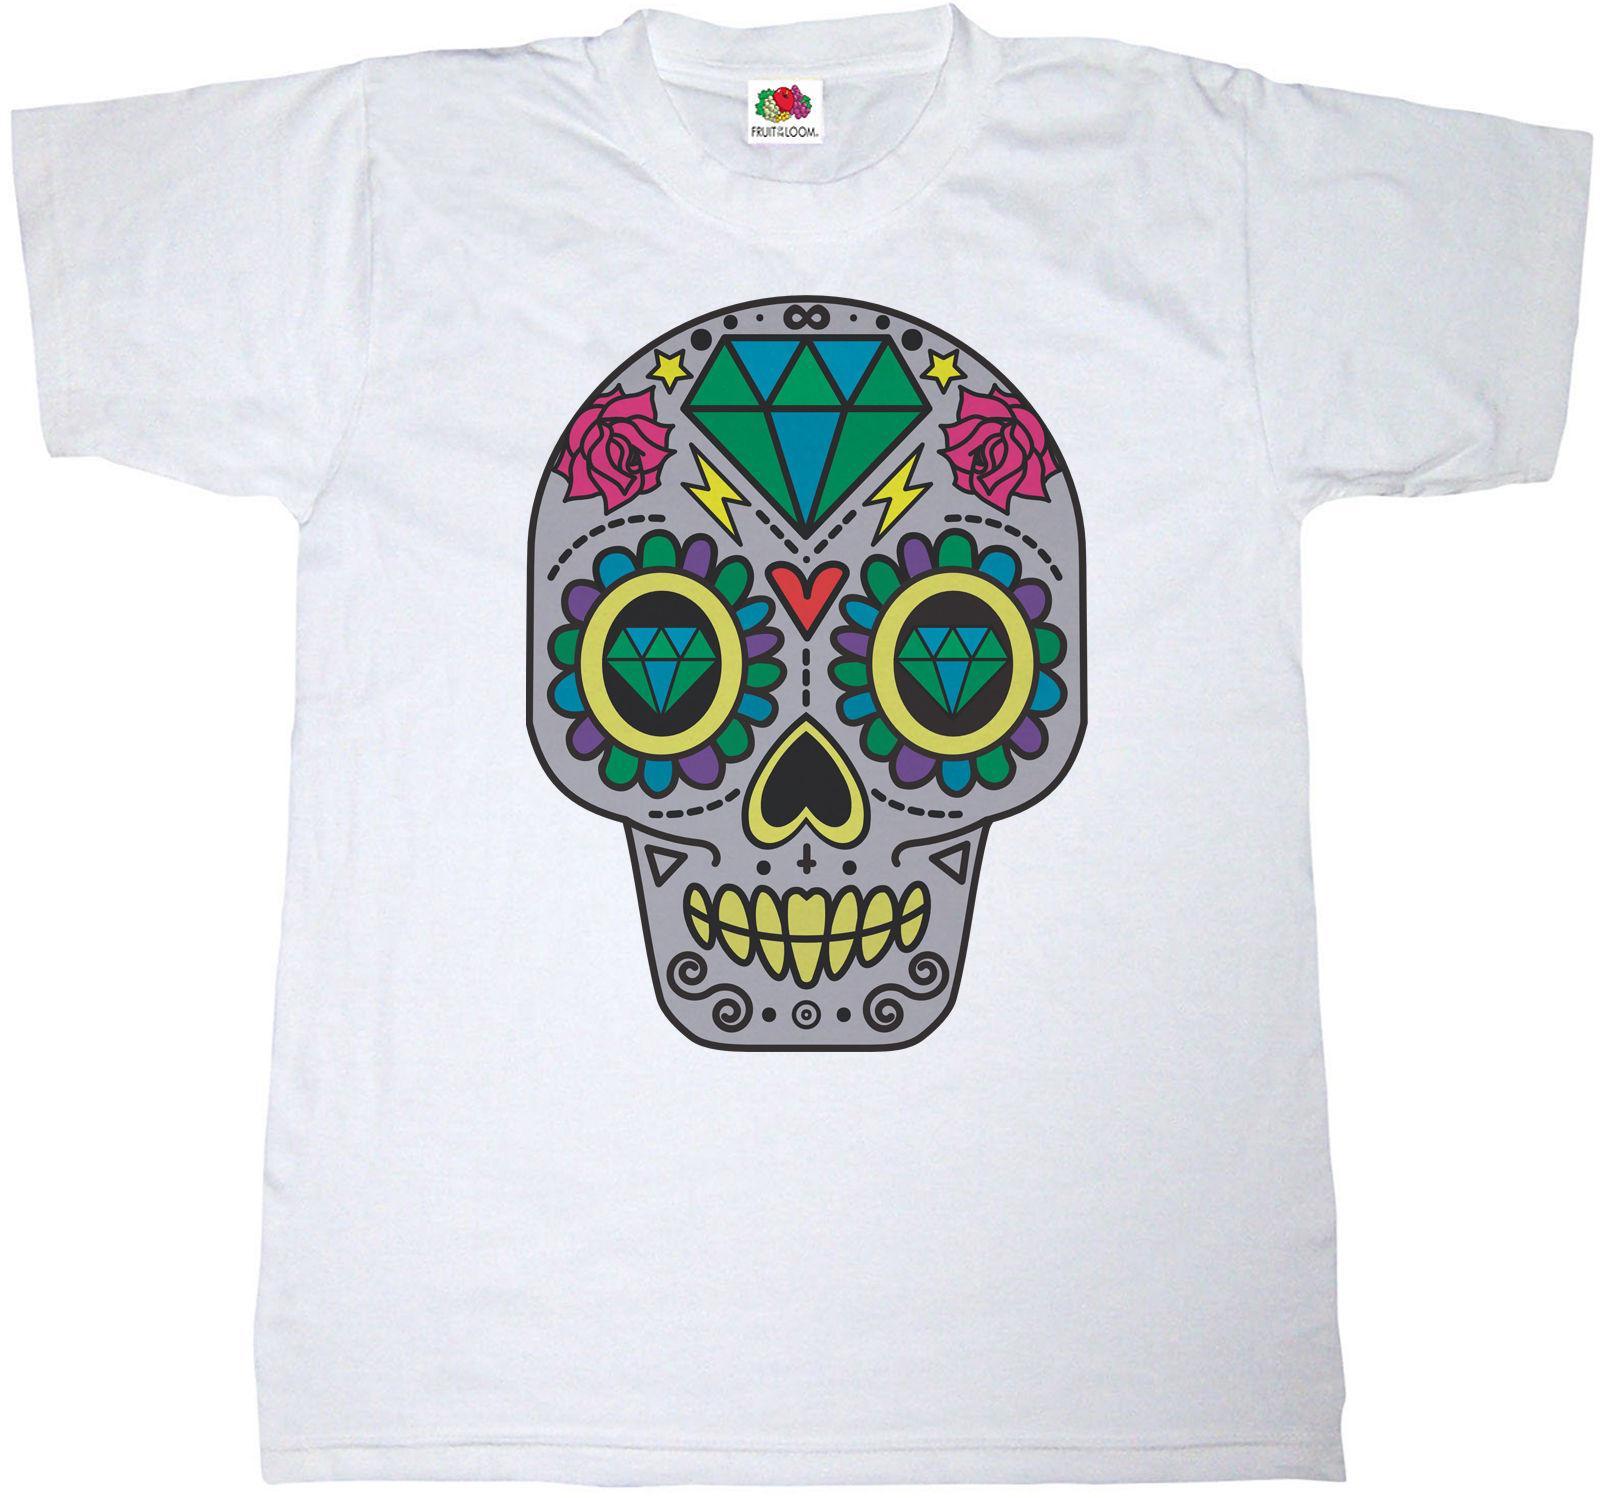 bf7cf547 SUGAR SKULL T SHIRT 100% COTTON CANDY MEXICO MEXICAN SKELETON HEART T SHIRT  FUN Ot Shirts Best Designer T Shirts From Beidhgate07, $11.01| DHgate.Com